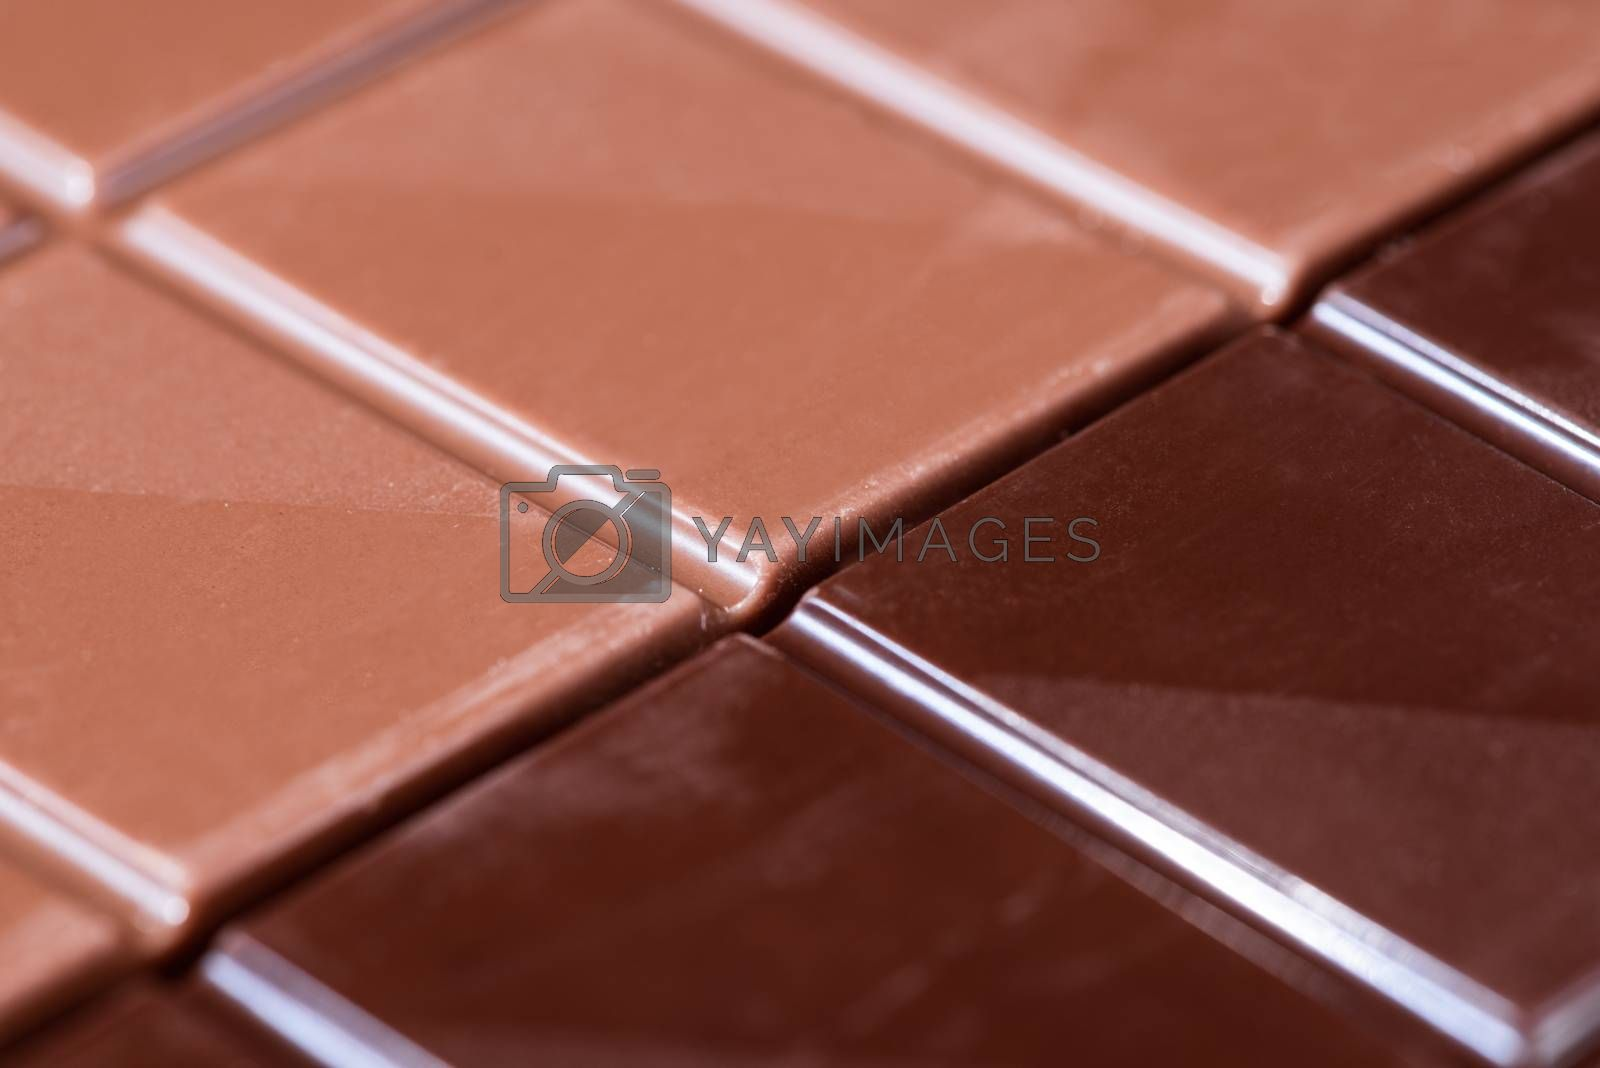 Chocolate Bar. Closeup Detail View. Top Down. Full Frame Backgro by merc67